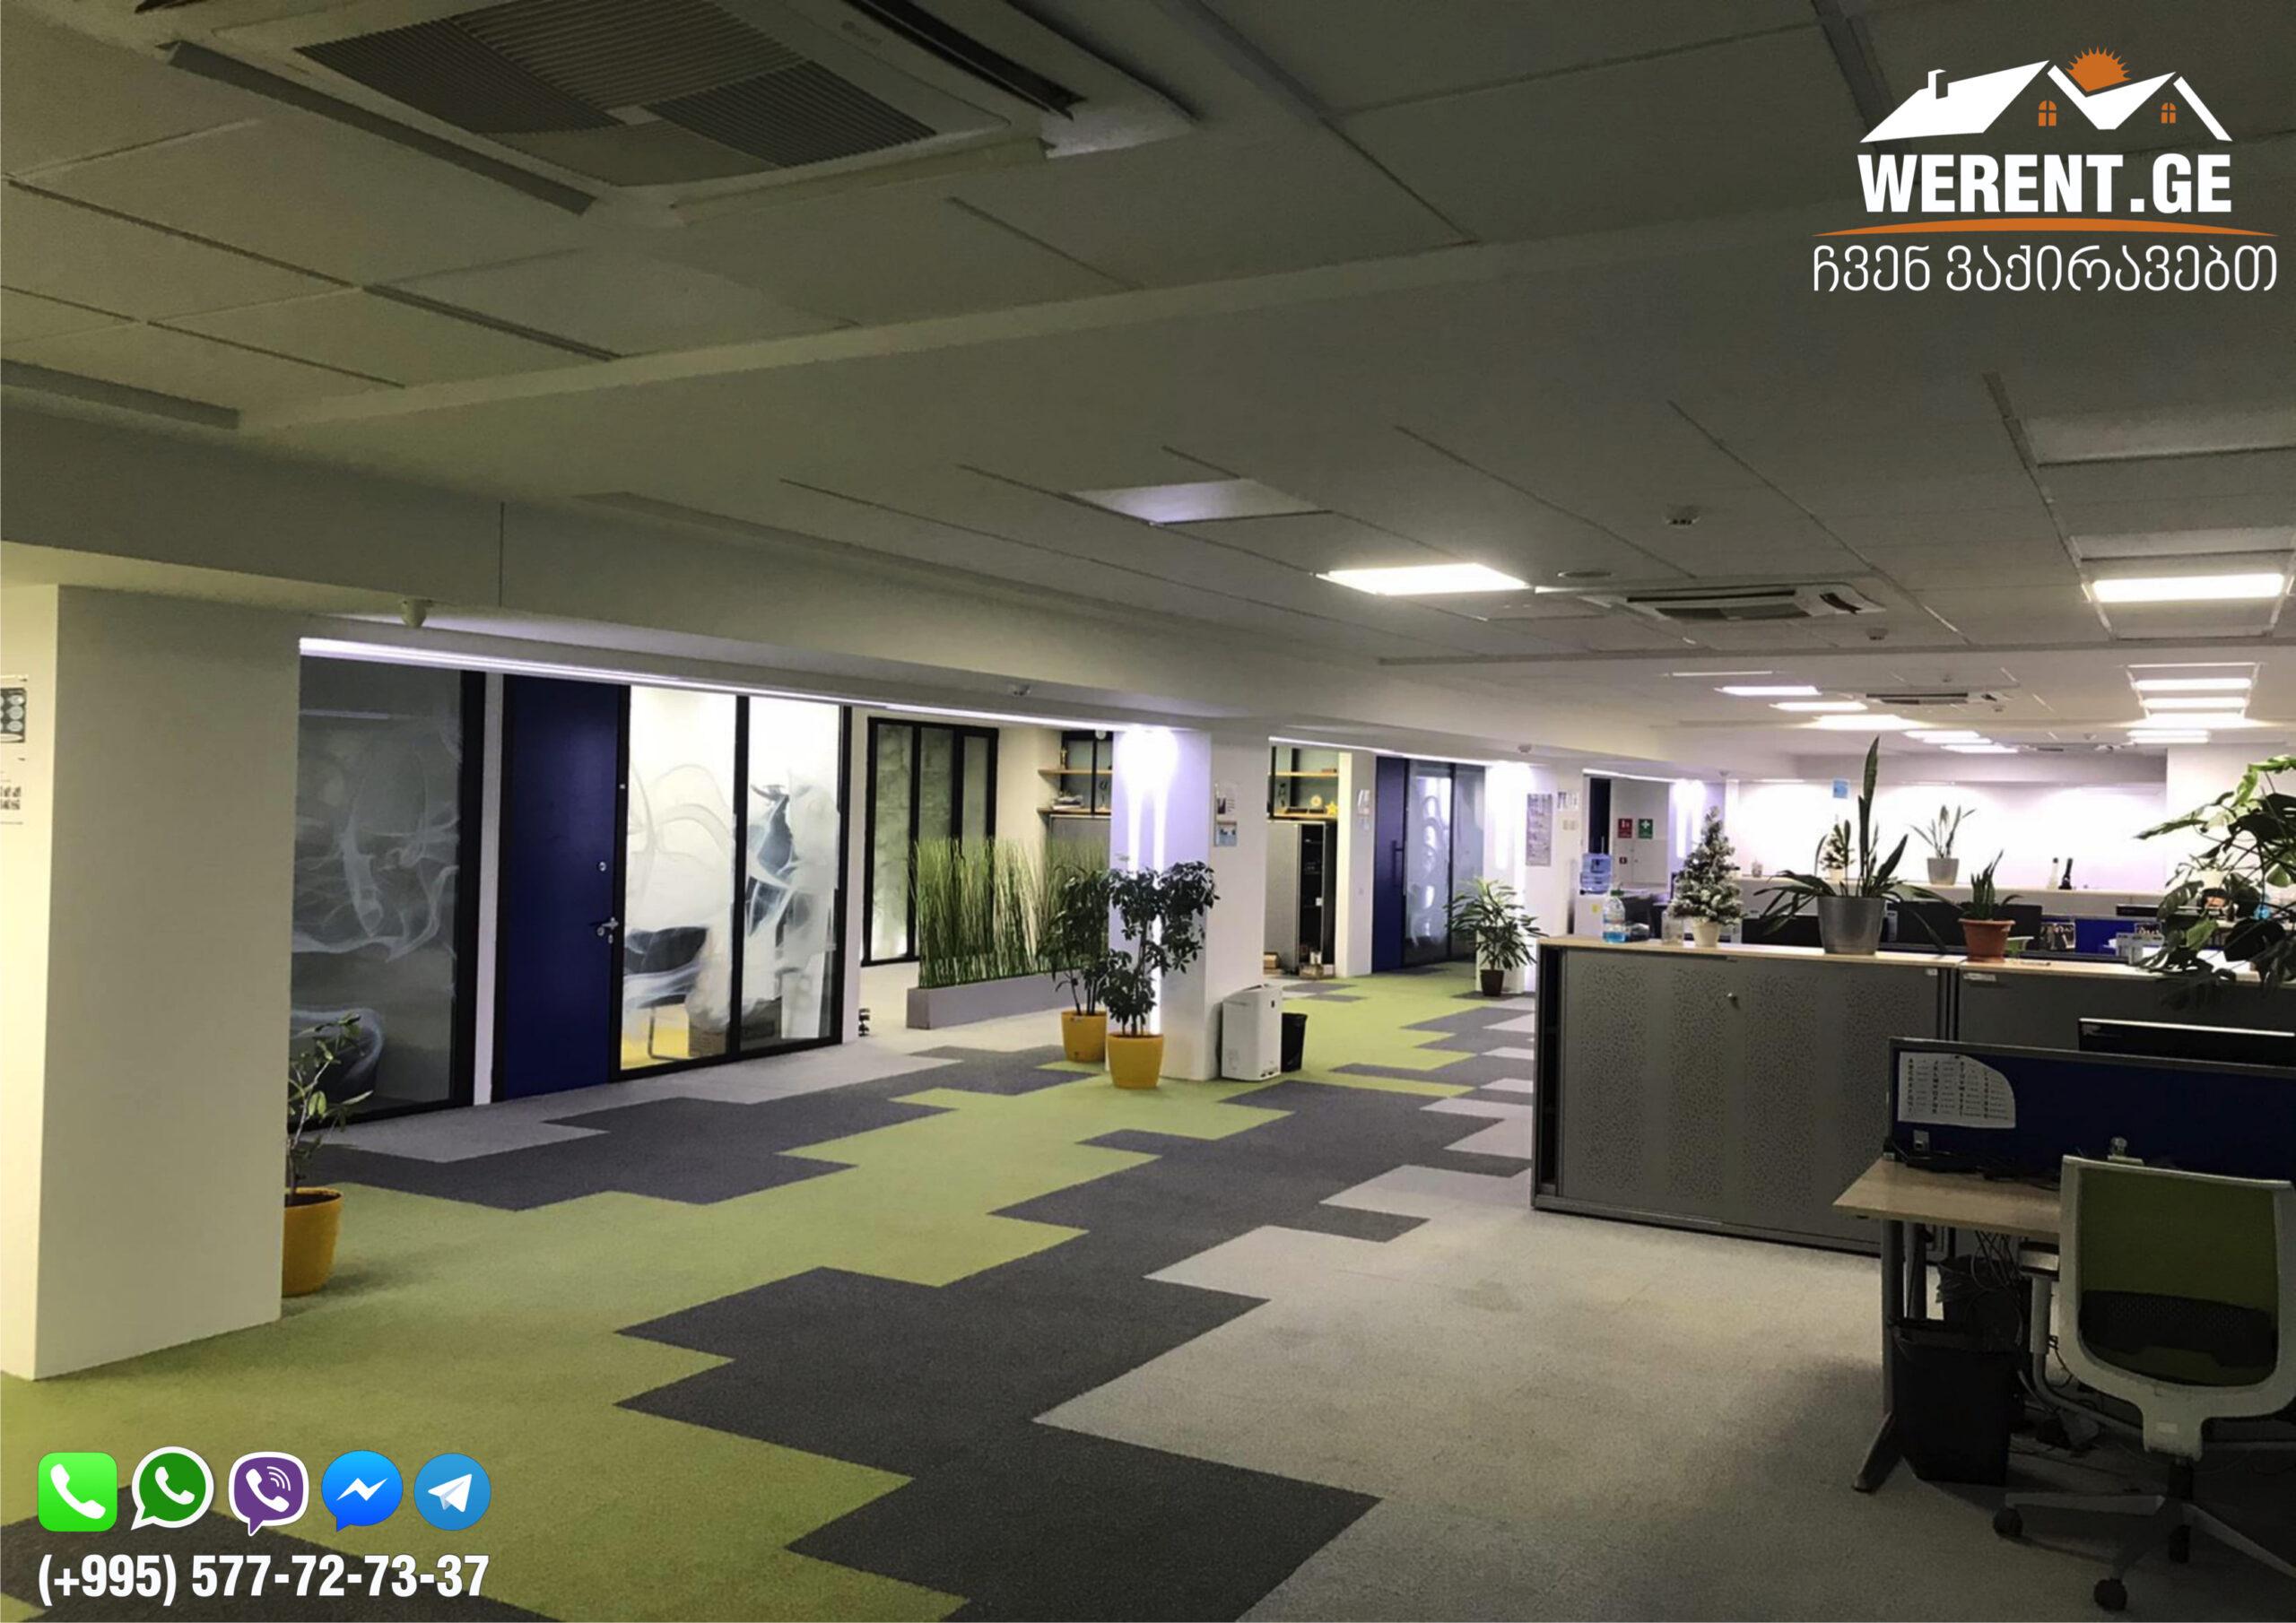 BCV presentation office space 689 sq m-07_wm